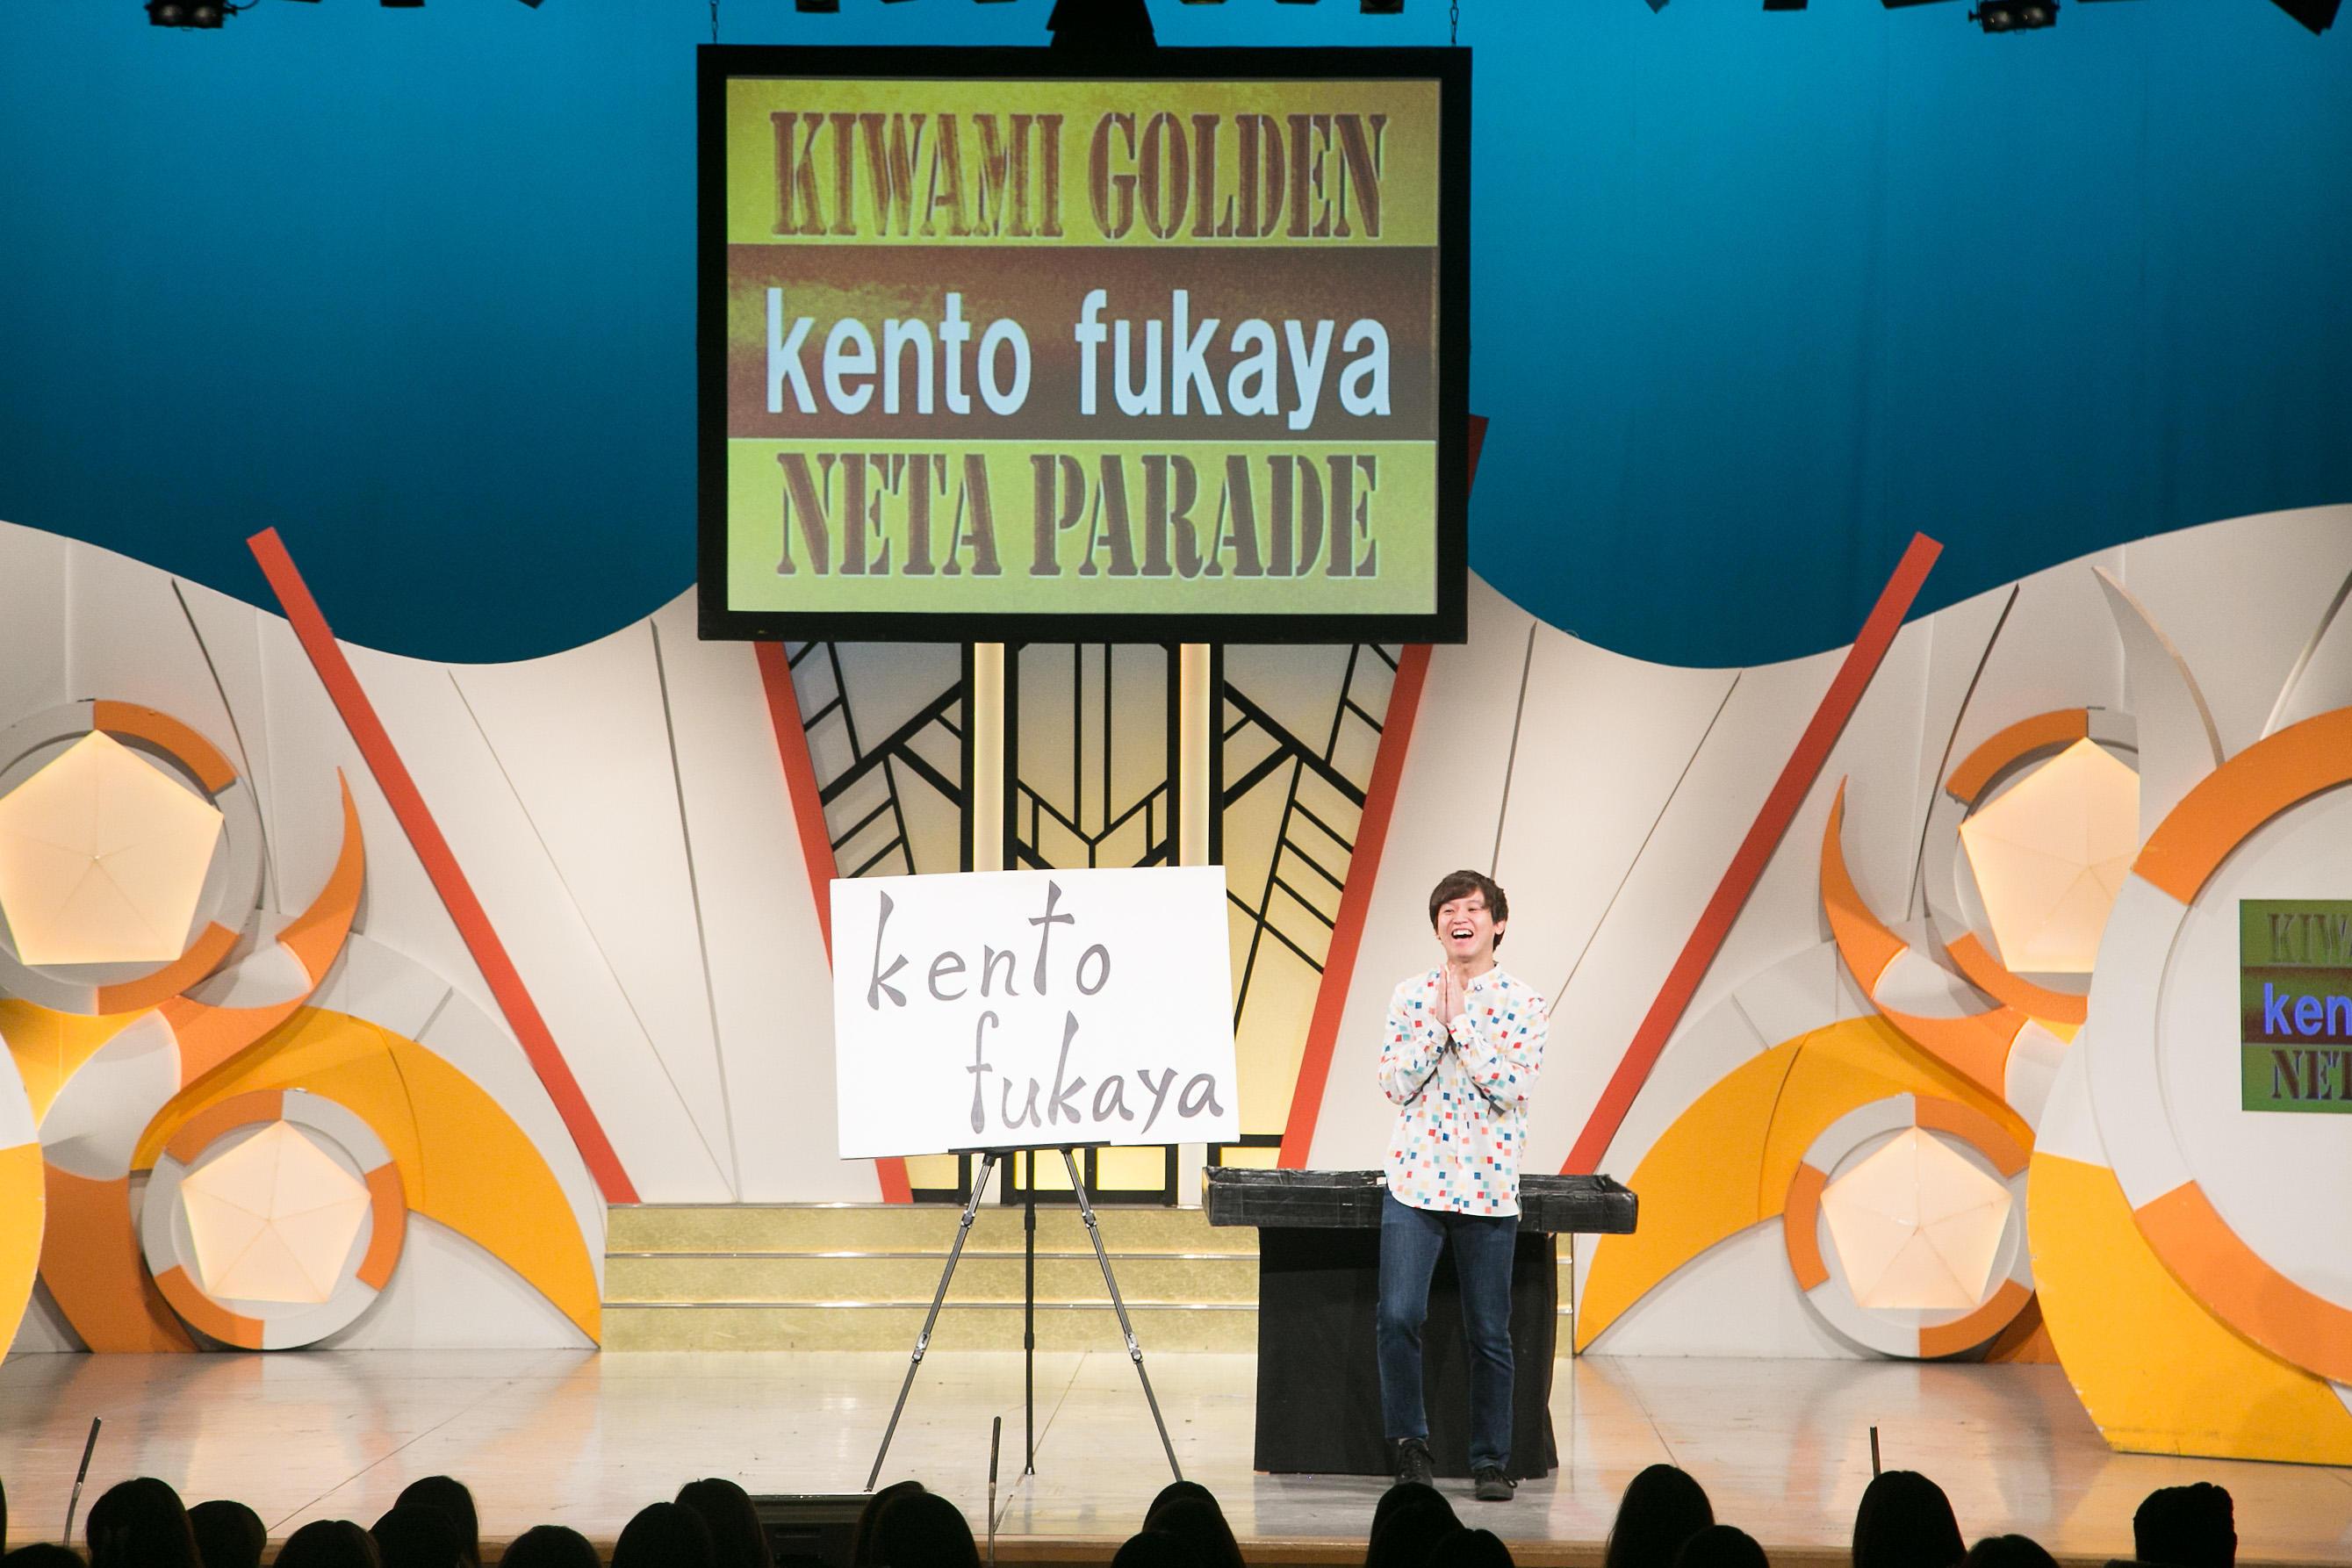 http://news.yoshimoto.co.jp/20171205221801-d25fb36670719d66240ab79ca42d471bd821def3.jpg